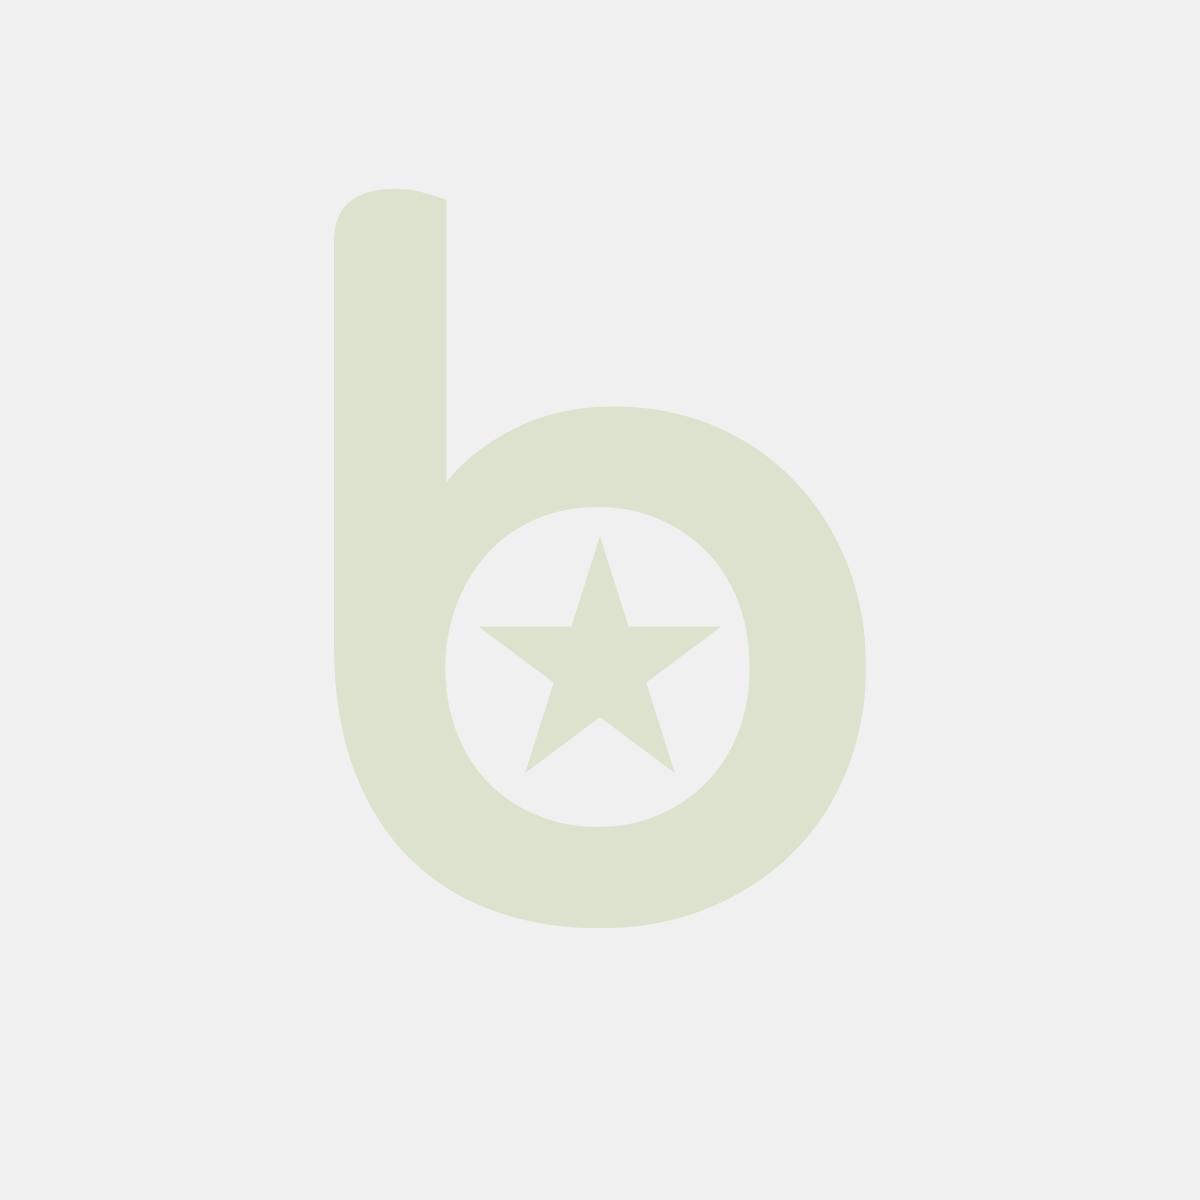 Bloczek samoprzylepny POST-IT® Super Sticky (622-12SSMAR-EU), 47,6x47,6mm, 12x90 kart., paleta Marrakesz